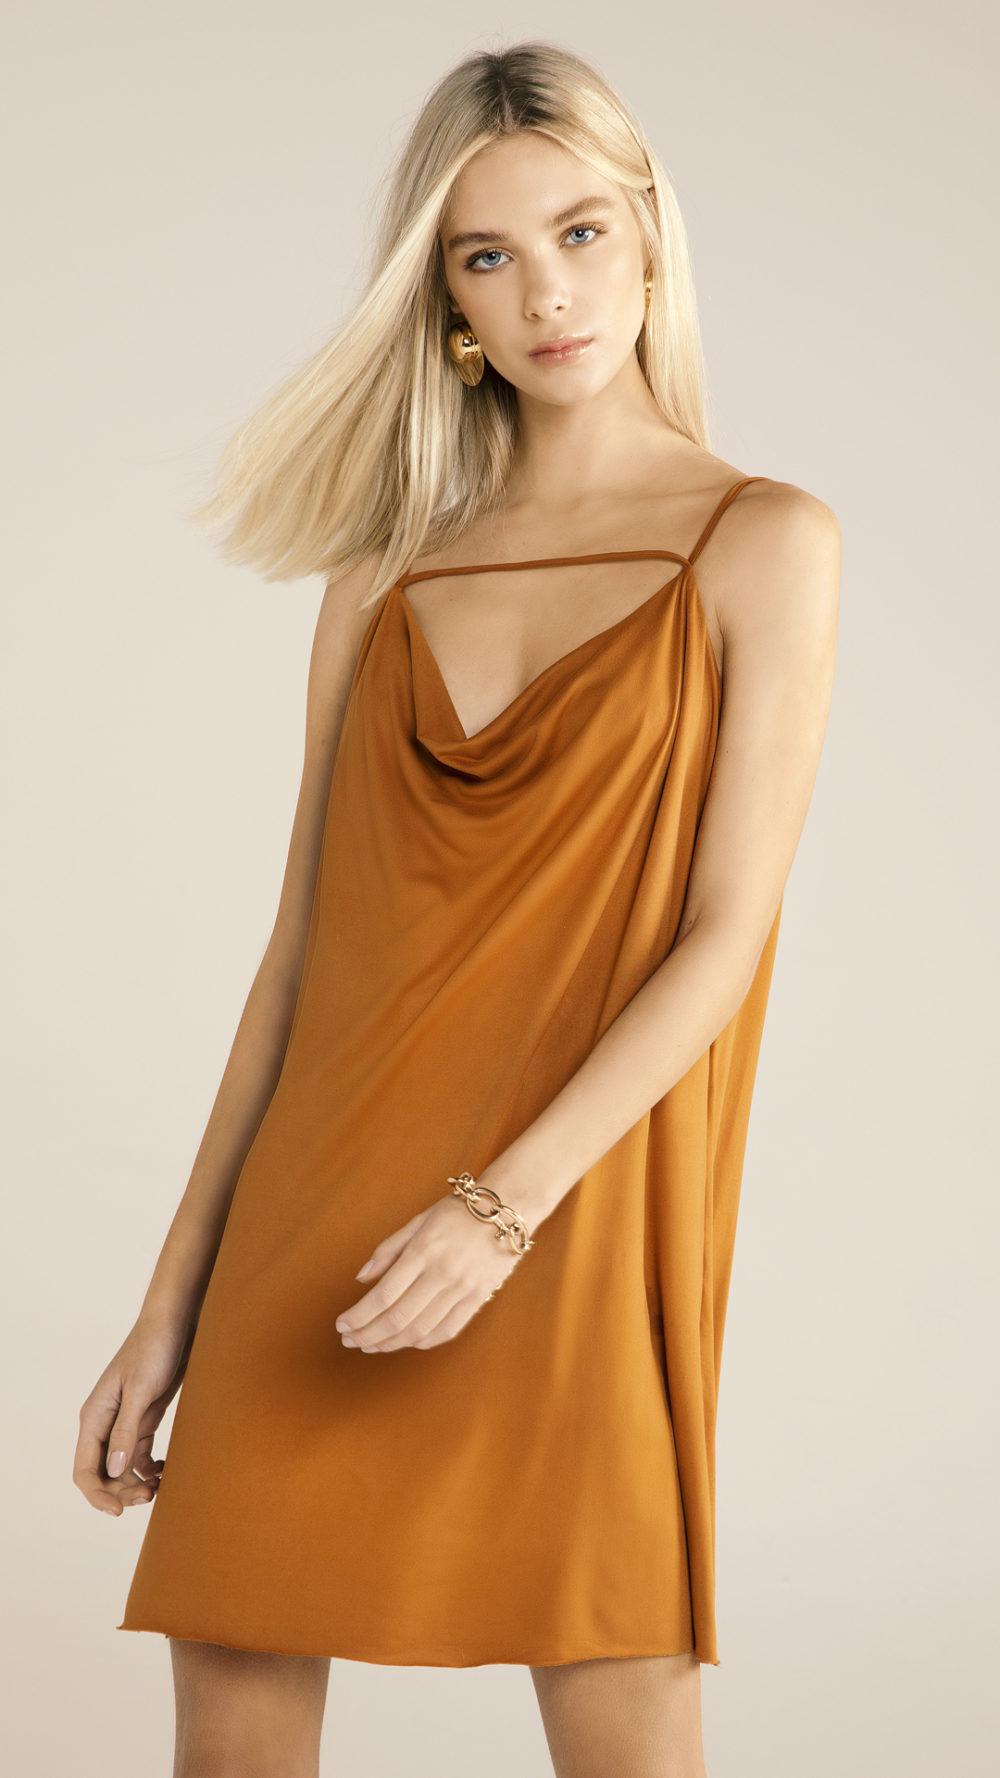 vestido bruna Iury costa